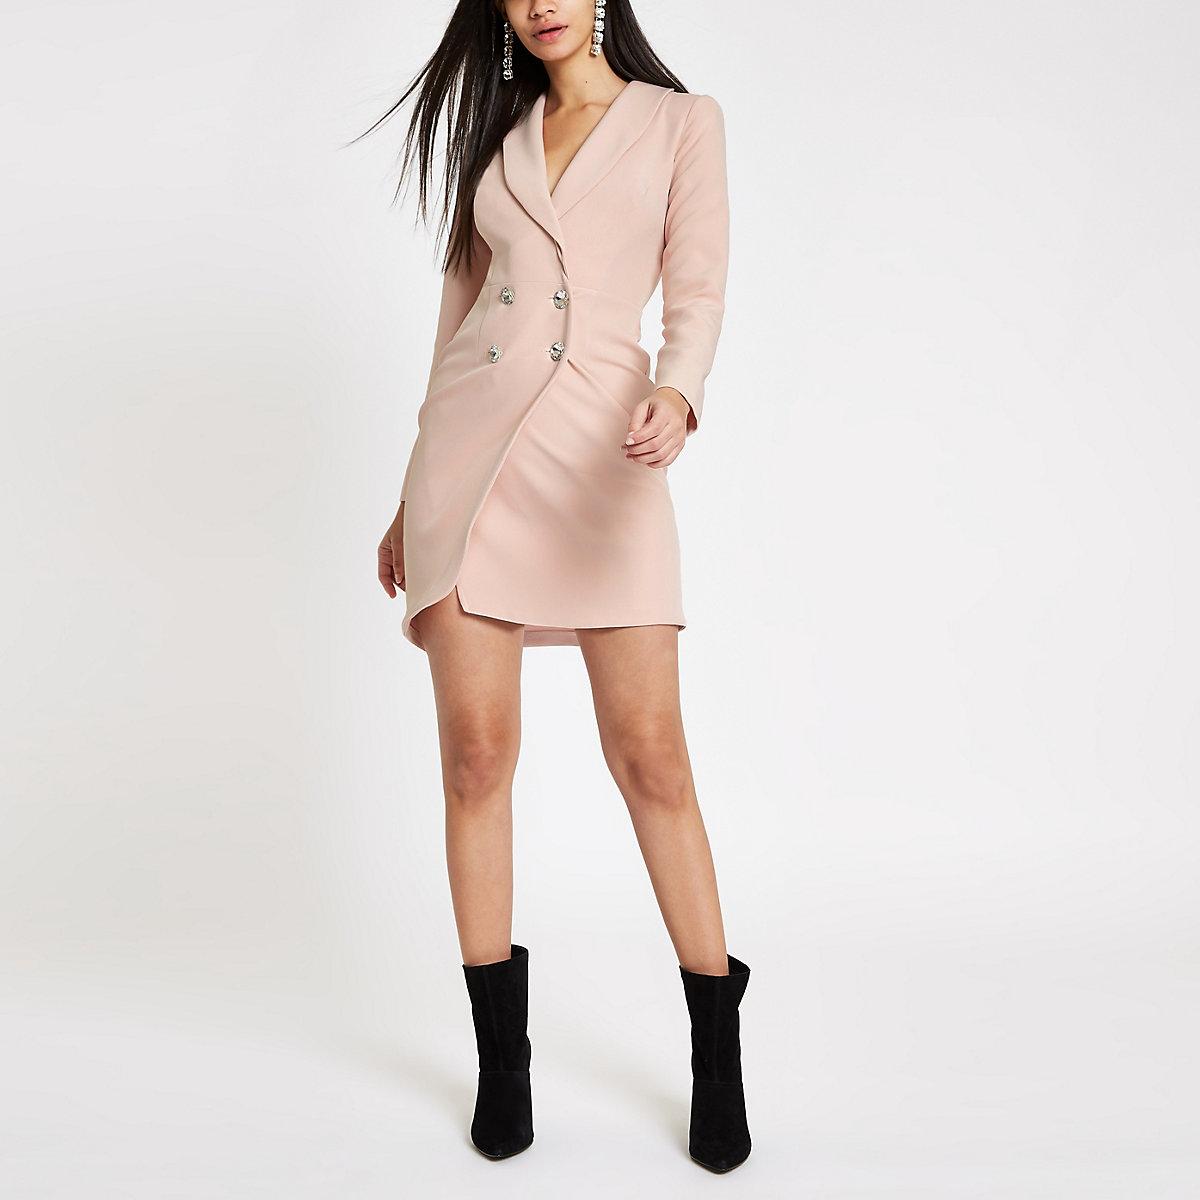 Light pink diamante bodycon tux dress